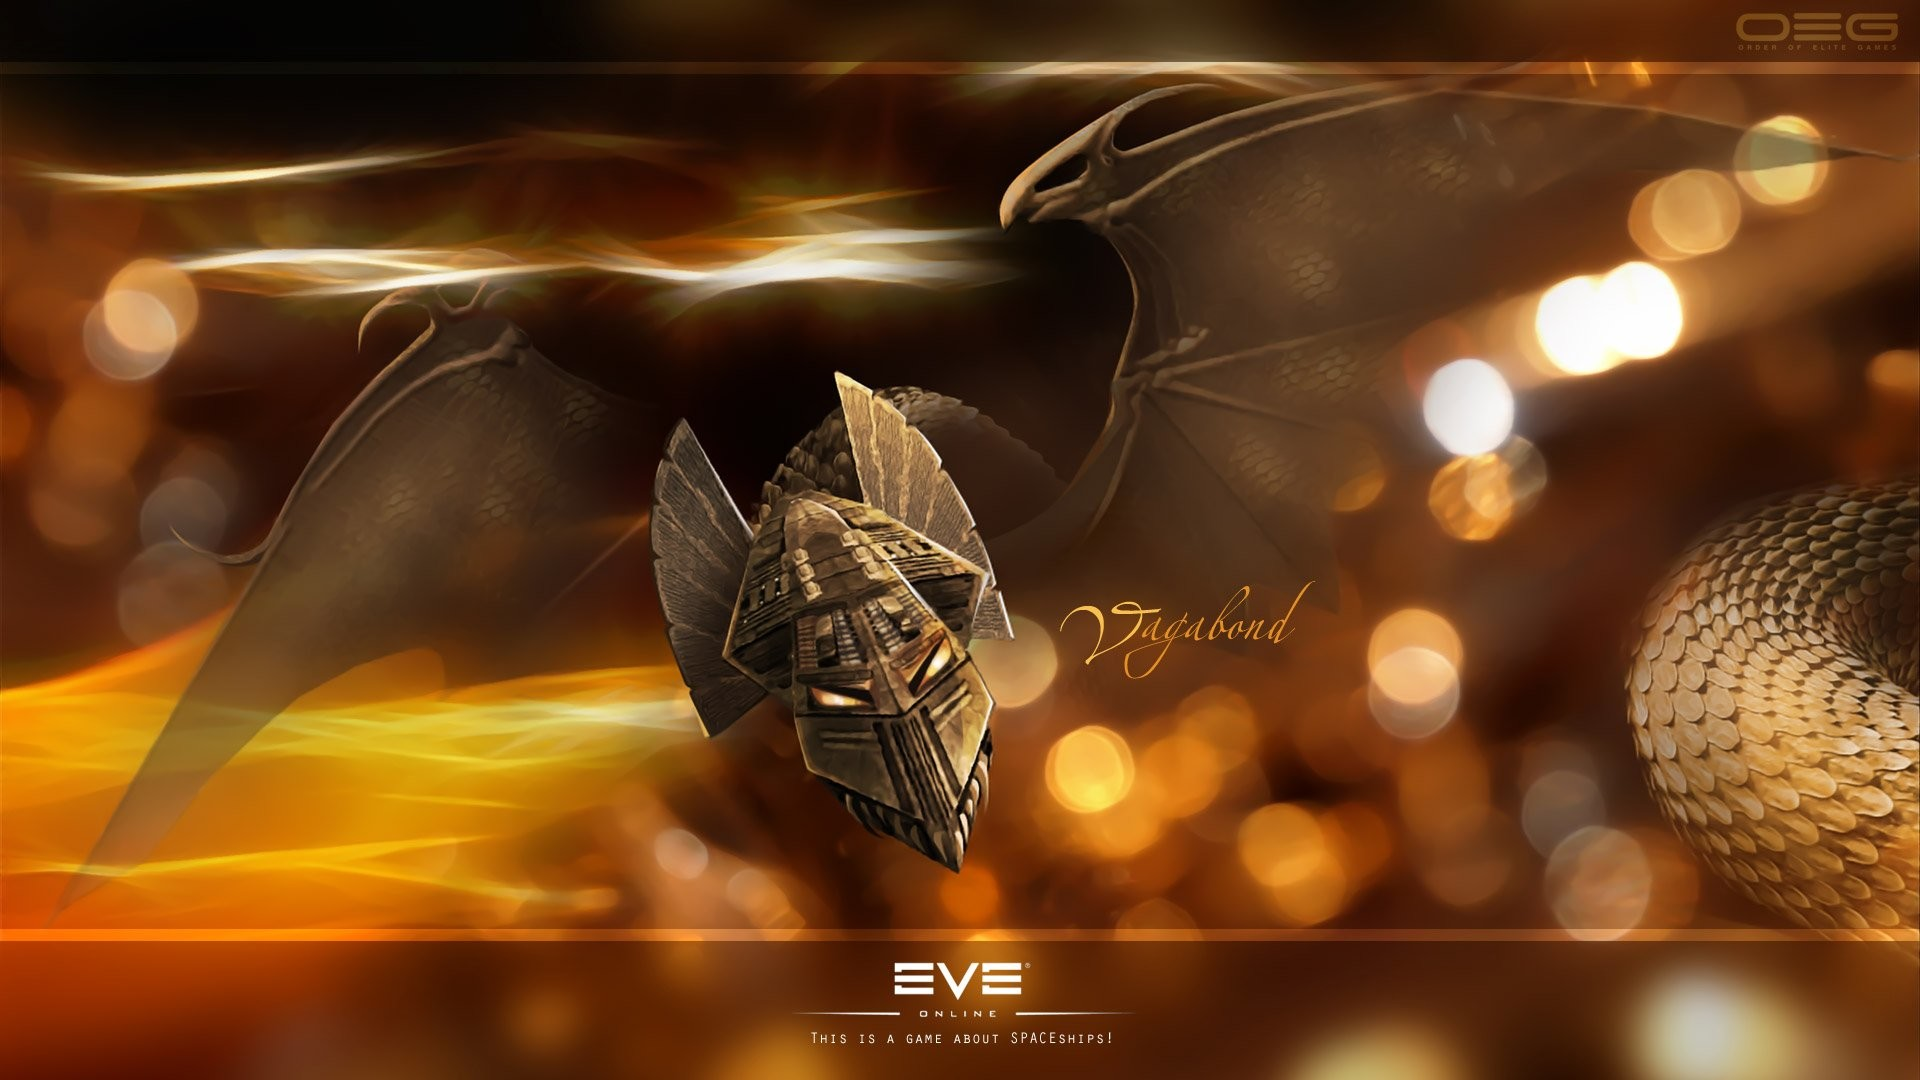 Eve Online Backgrounds